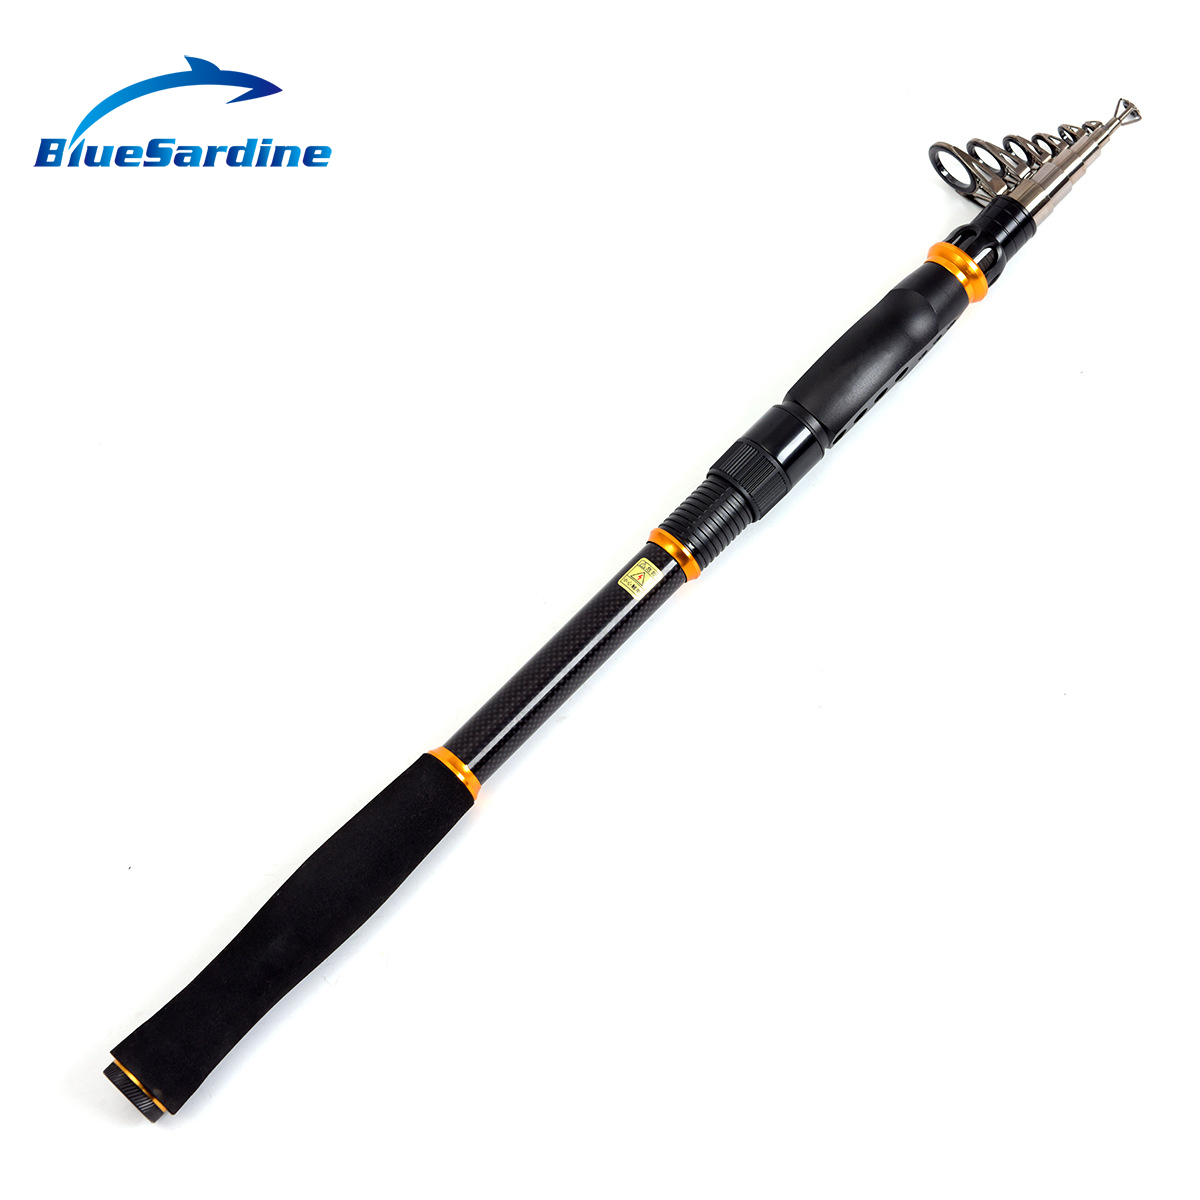 BlueSardine Spinning Fishing Rod Carbon Sea Fishing Telescopic Rod 2.1M 2.4M 2.7M 3.0M 3.6M